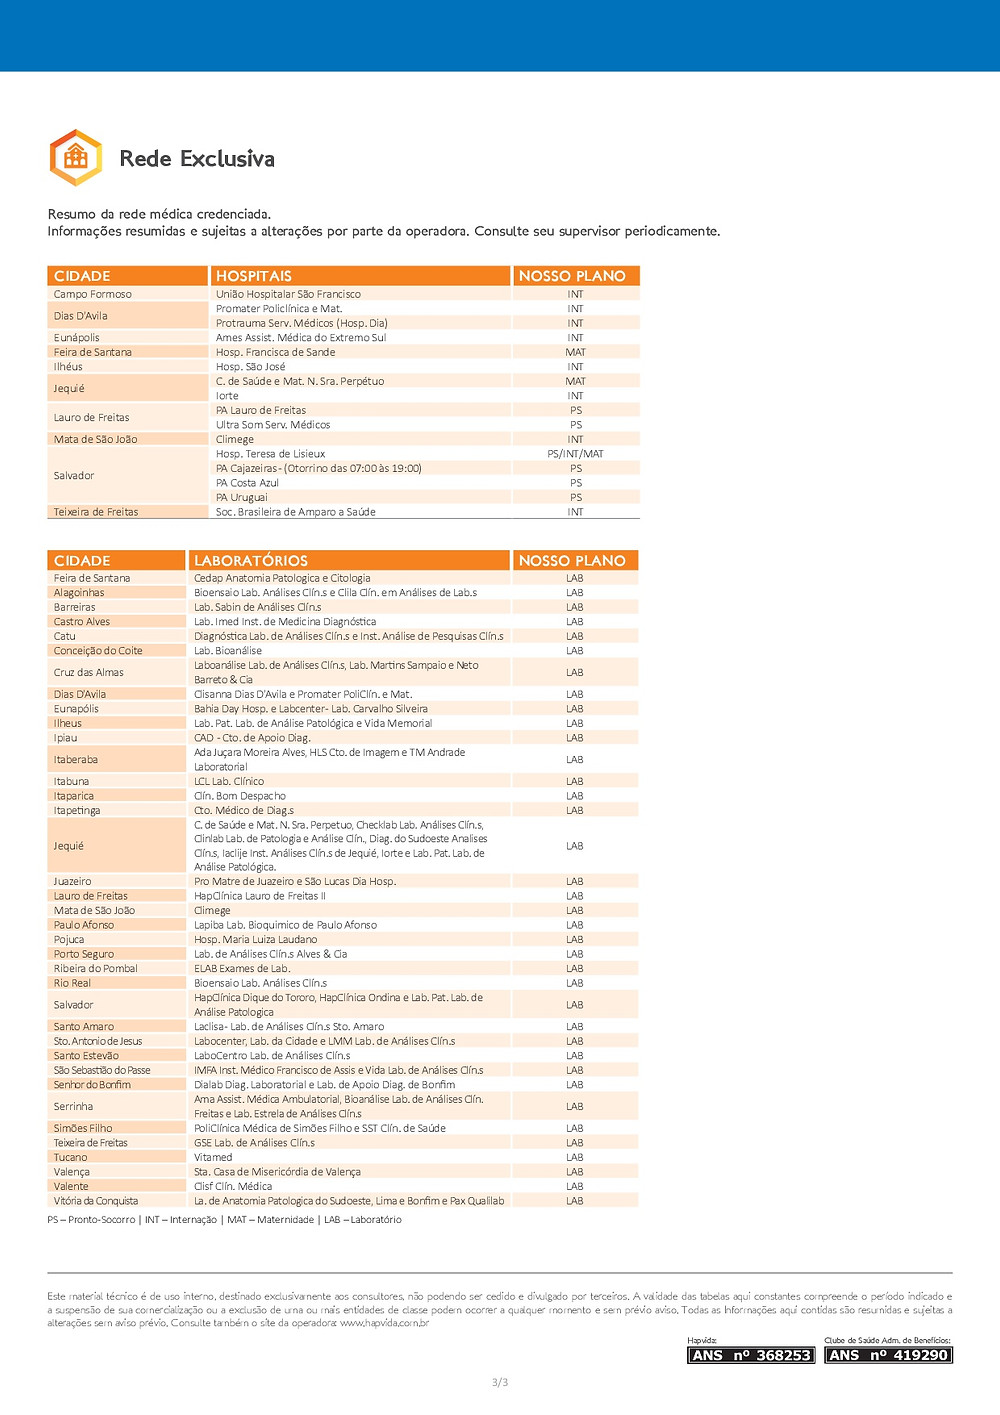 Vendas Digital | HapVida - Planos de Saude Salvador